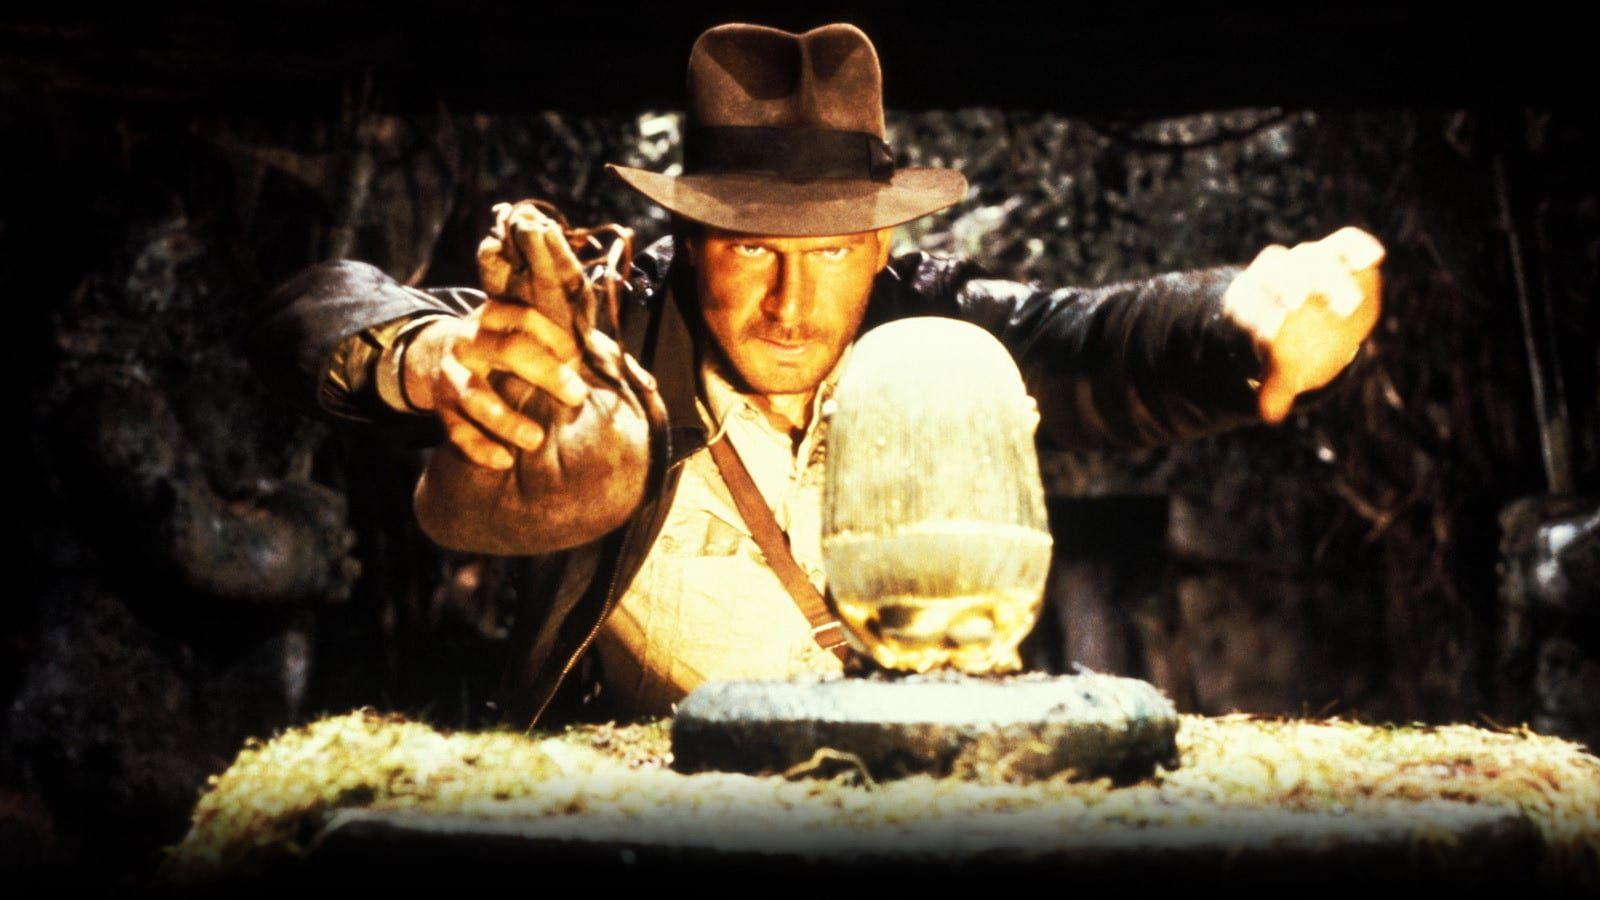 Watch Jager Des Verlorenen Schatzes 1981 Putlocker Film Complet Streaming Der Archaologe Dr Henry Jones Wird N Indiana Jones Free Movies Online Adventure Film